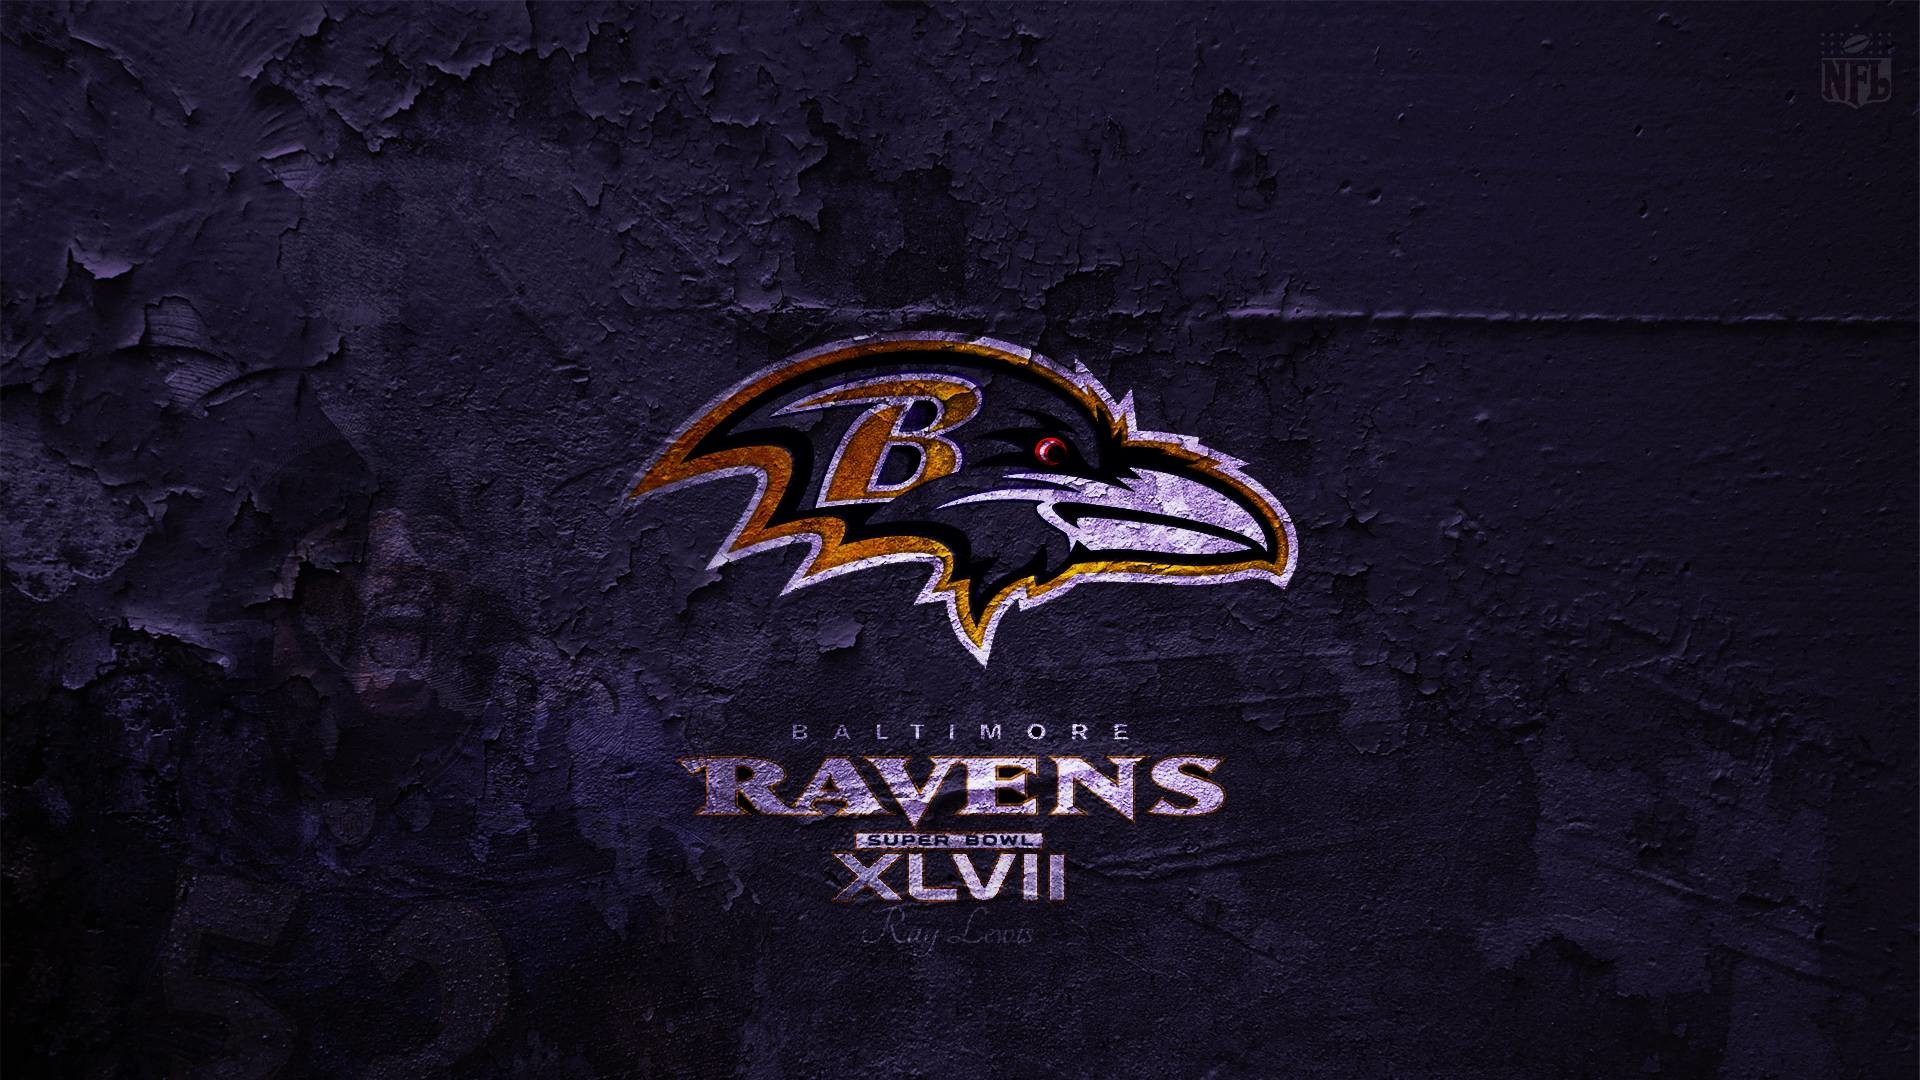 Baltimore Ravens Screensavers And Wallpaper 72 Images